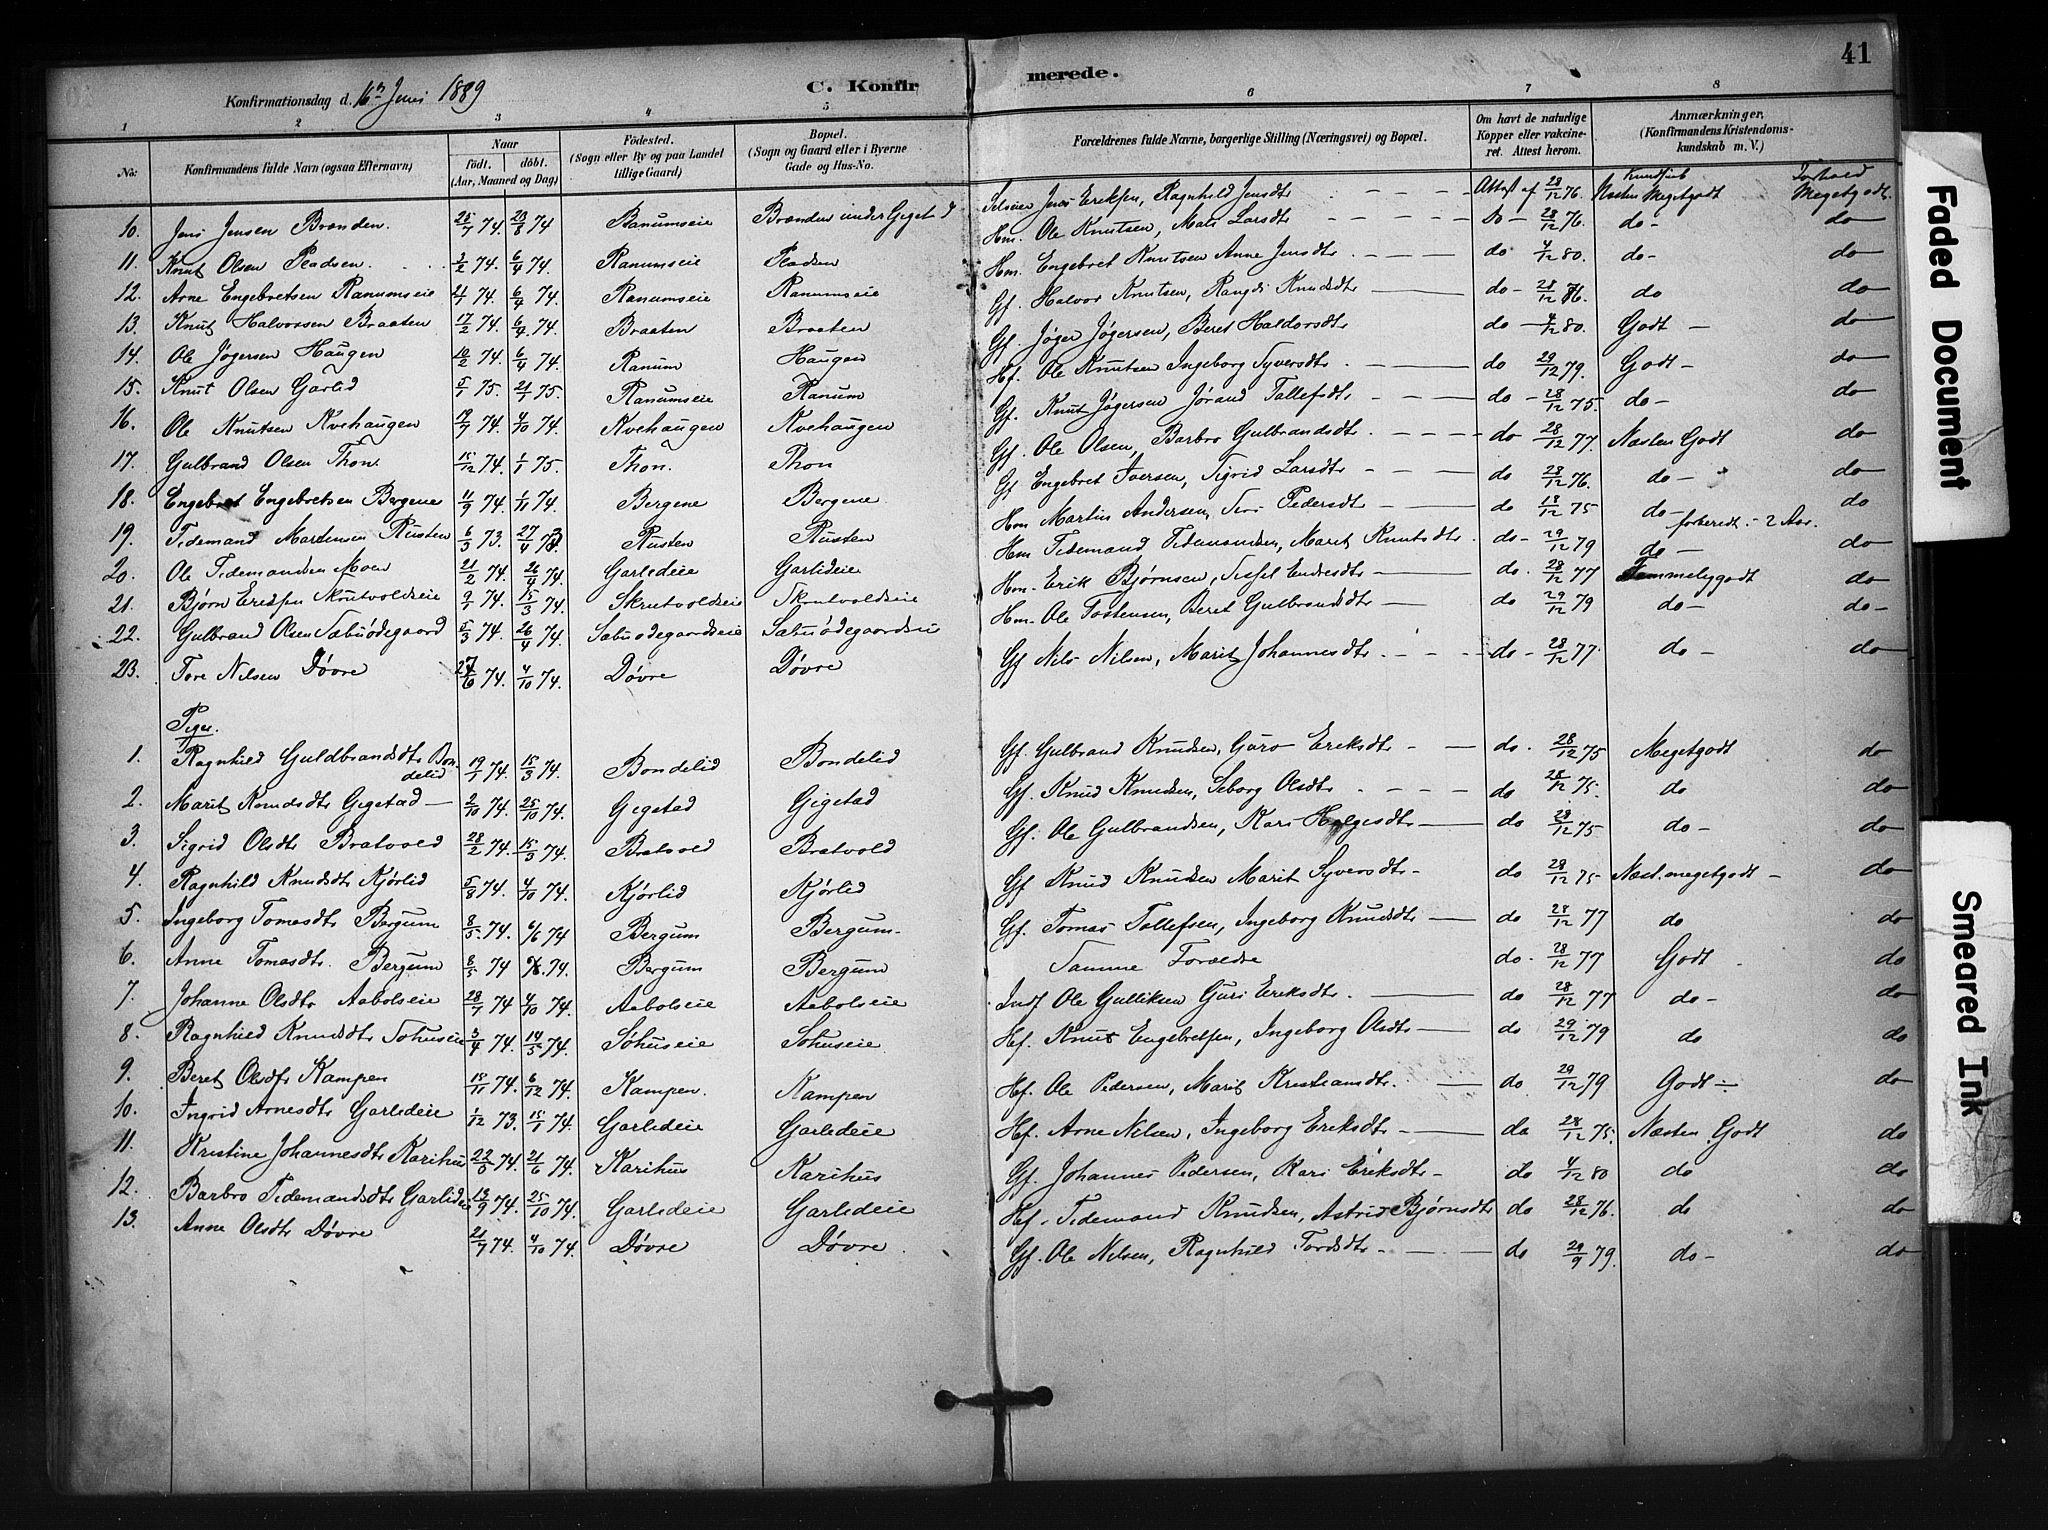 SAH, Nord-Aurdal prestekontor, Ministerialbok nr. 12, 1883-1895, s. 41